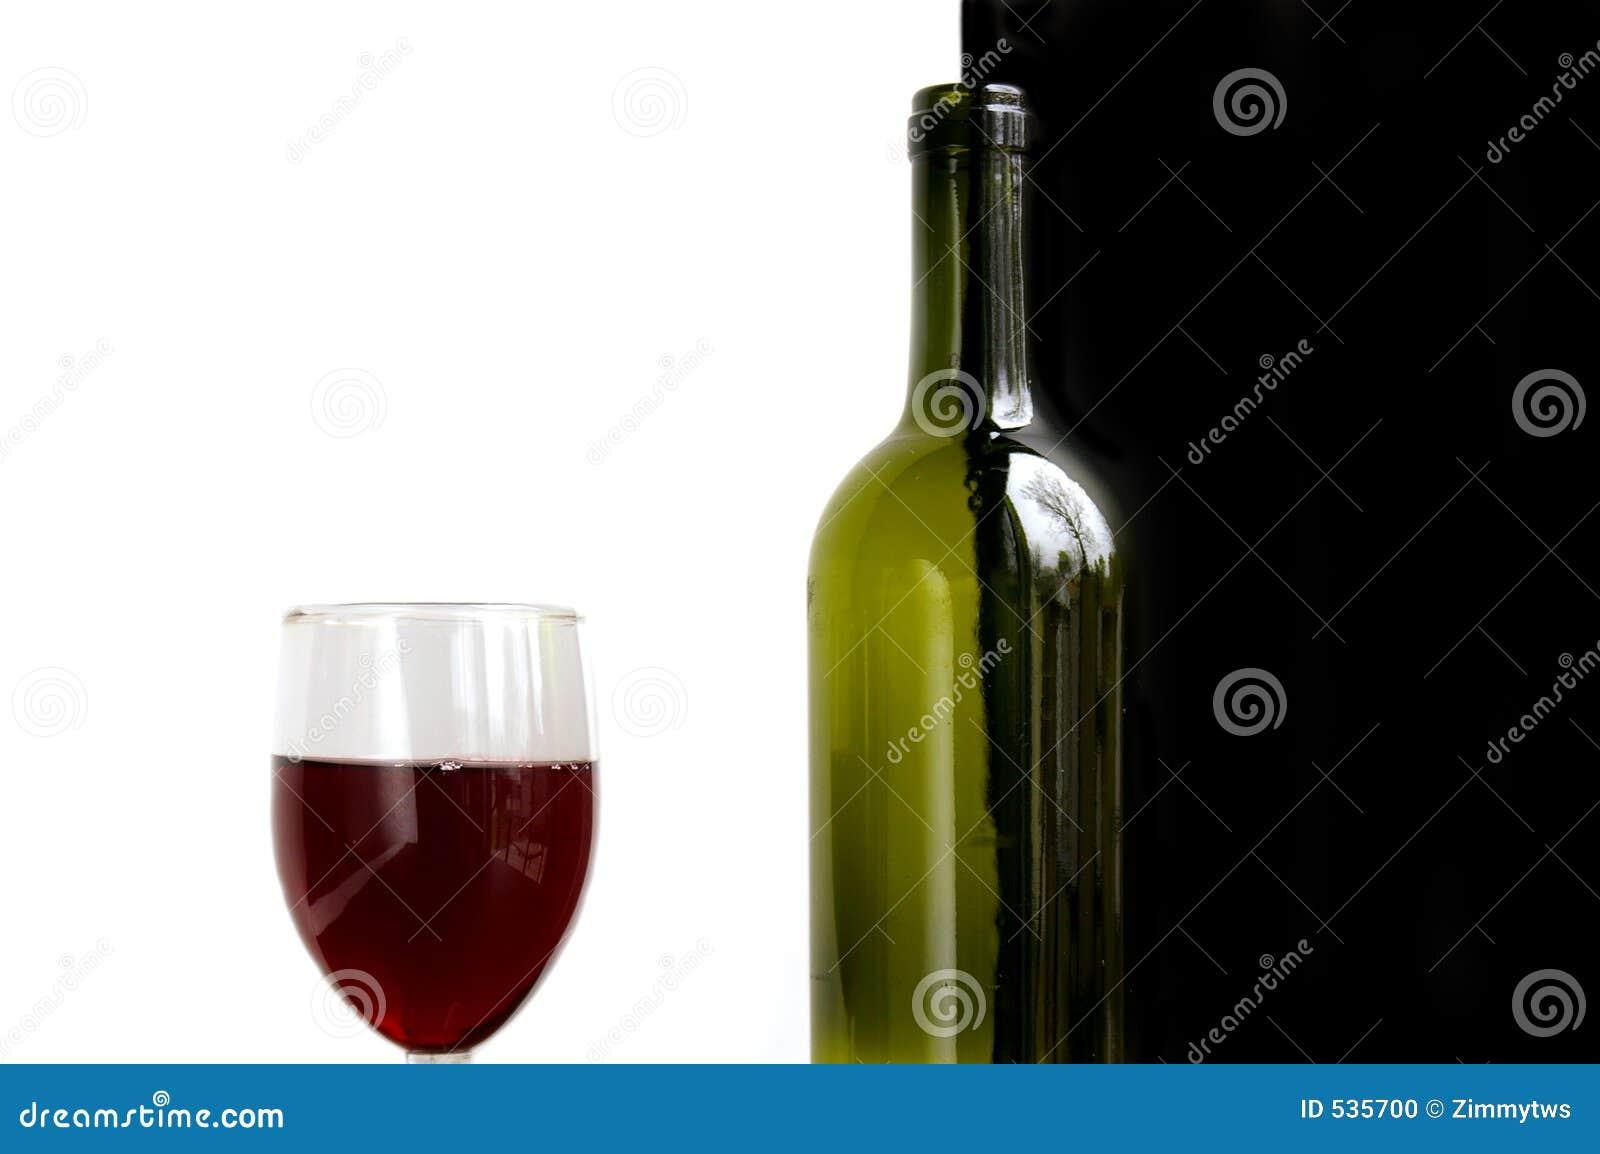 Download 玻璃瓶 库存照片. 图片 包括有 附注, 打赌的人, bothy, 中间, 加伯奈葡萄酒, 颜色, 复杂, 正餐 - 535700